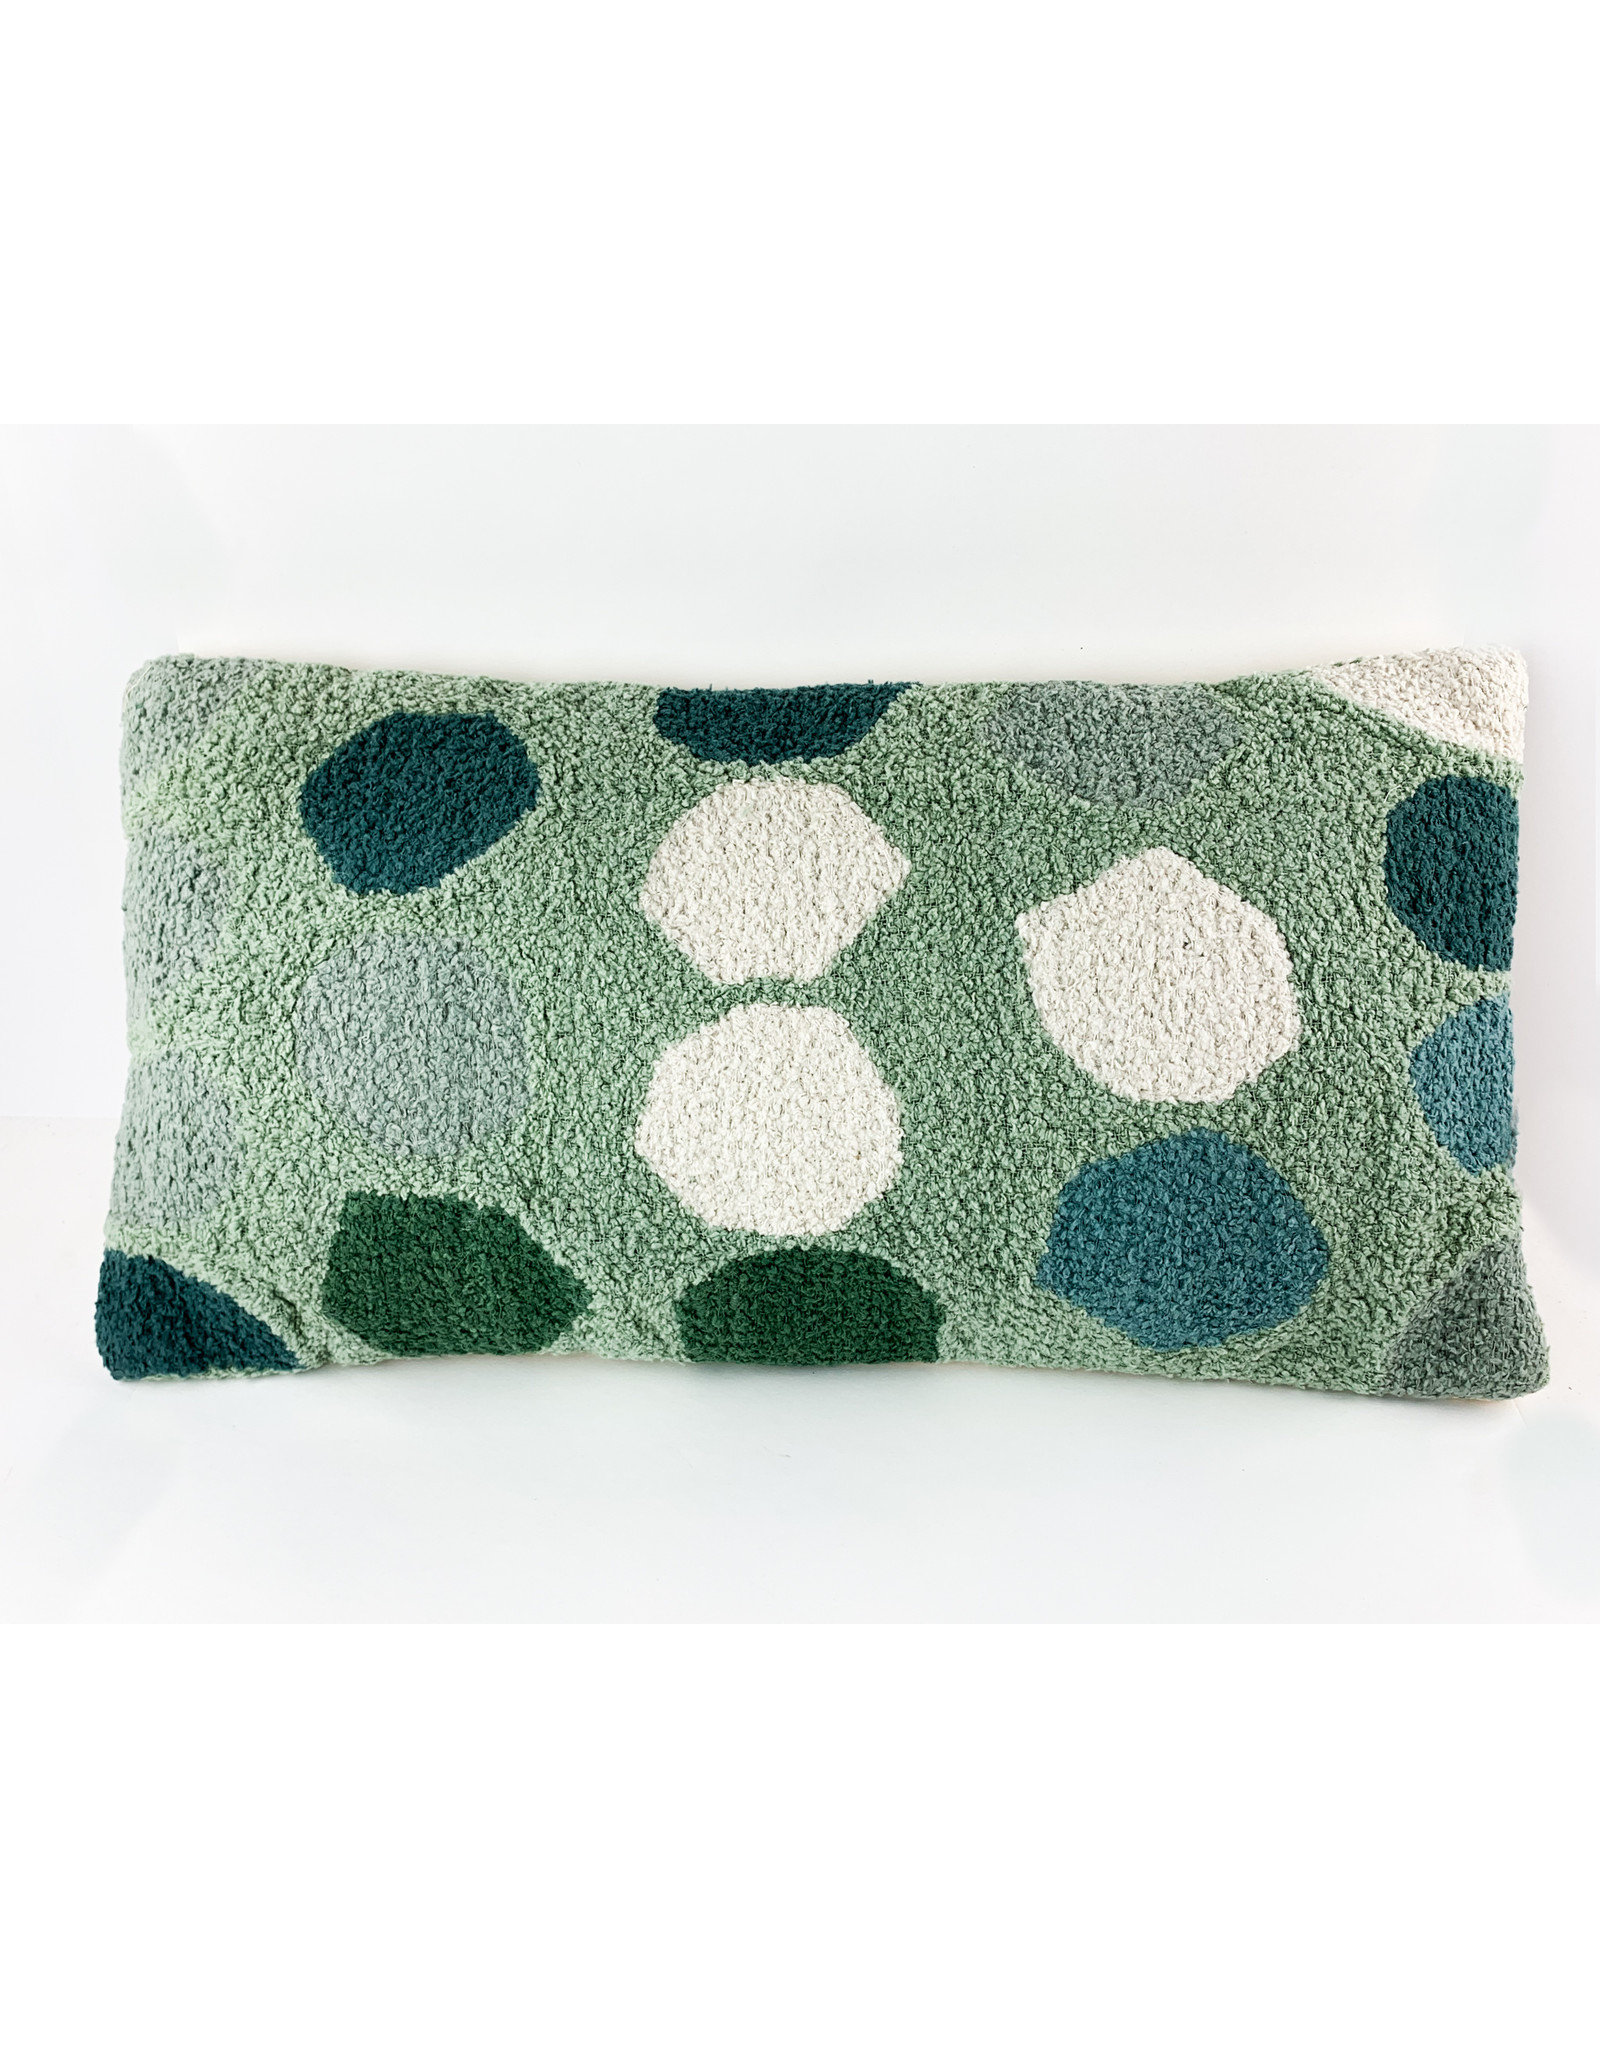 Creative Co-Op 24 x 12 Green Lumbar With Dots